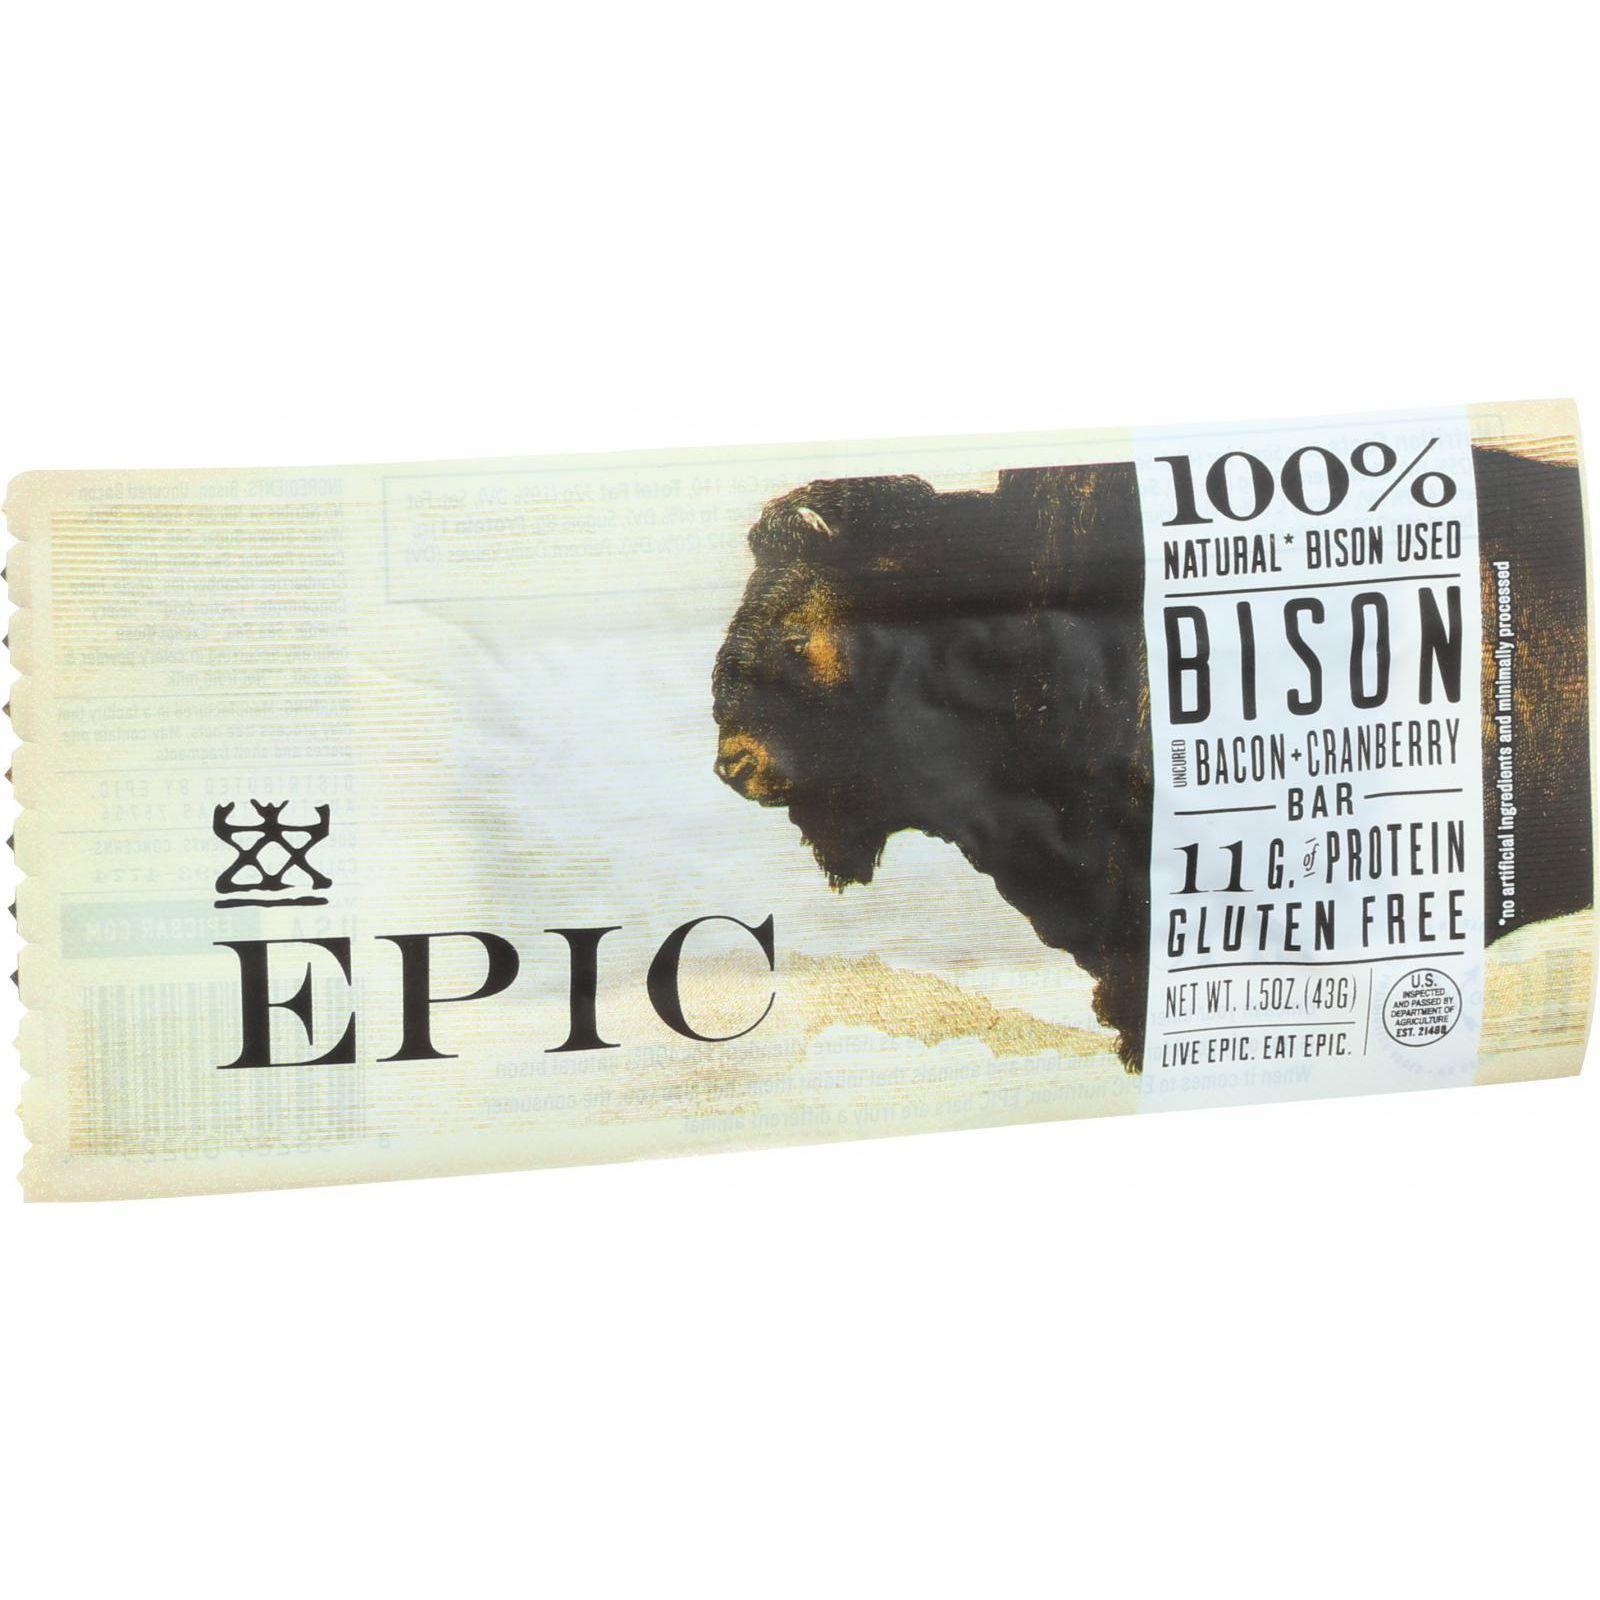 Epic Bar - Bison Bacon Cranberry - 1.5 Oz Bars - Case Of 12